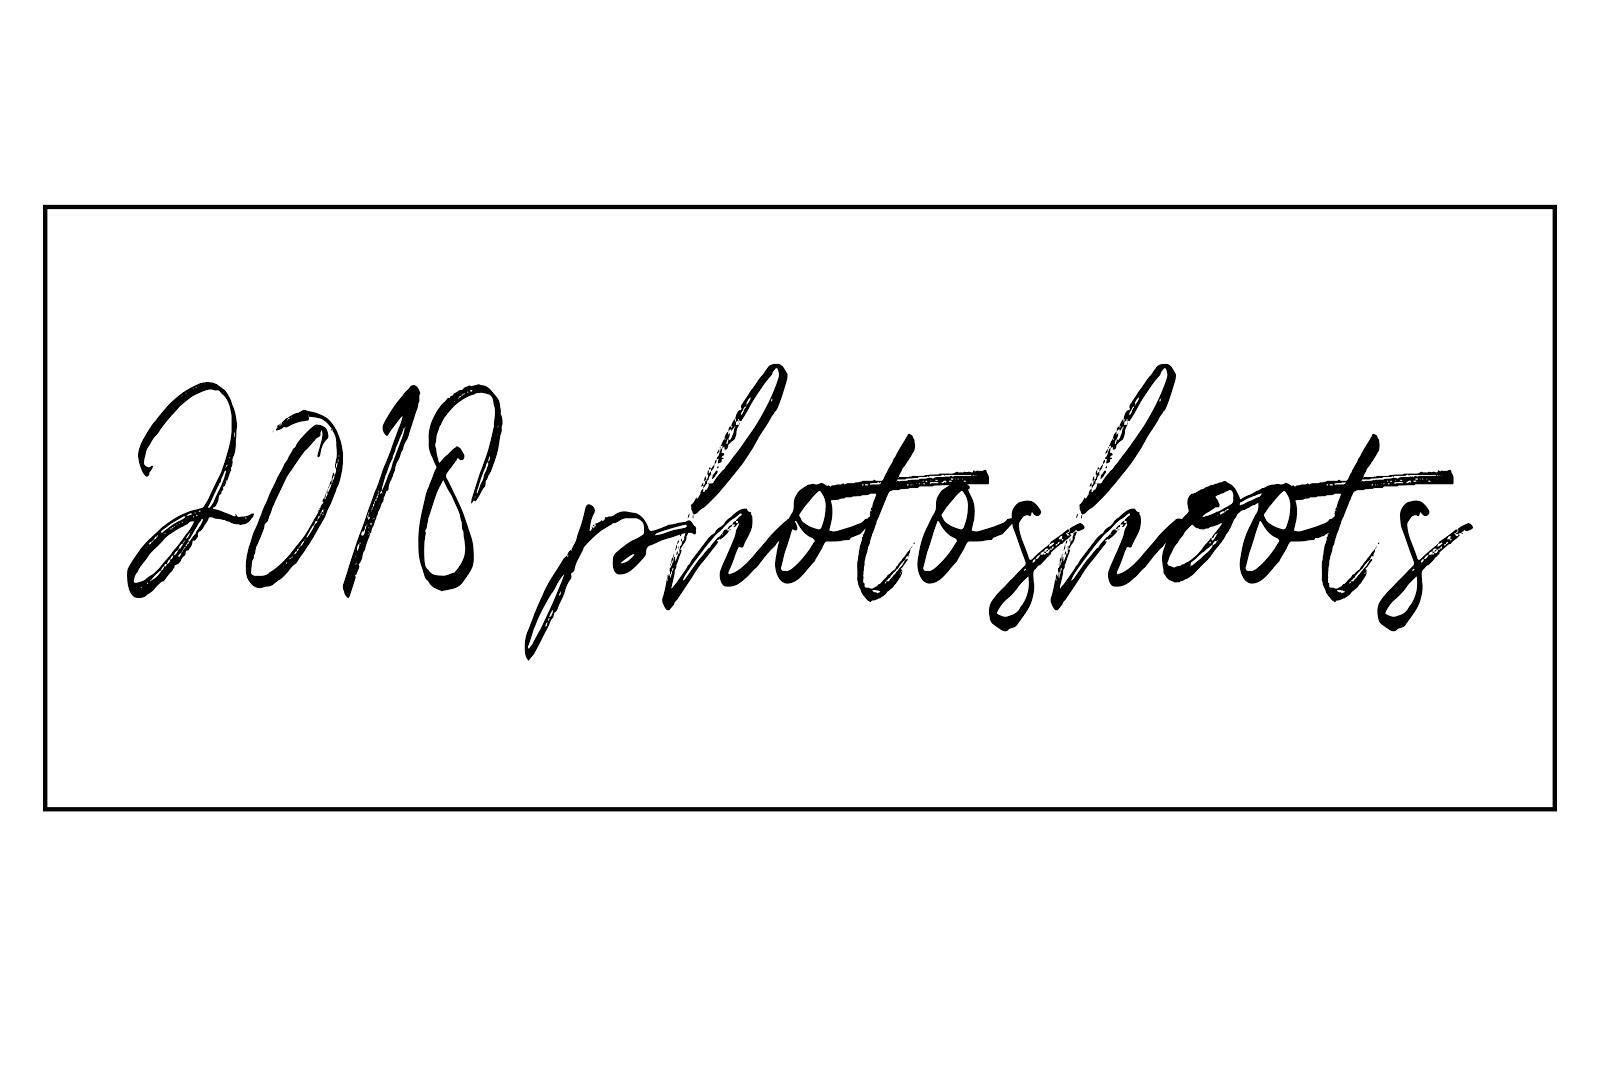 2018 Photoshoots